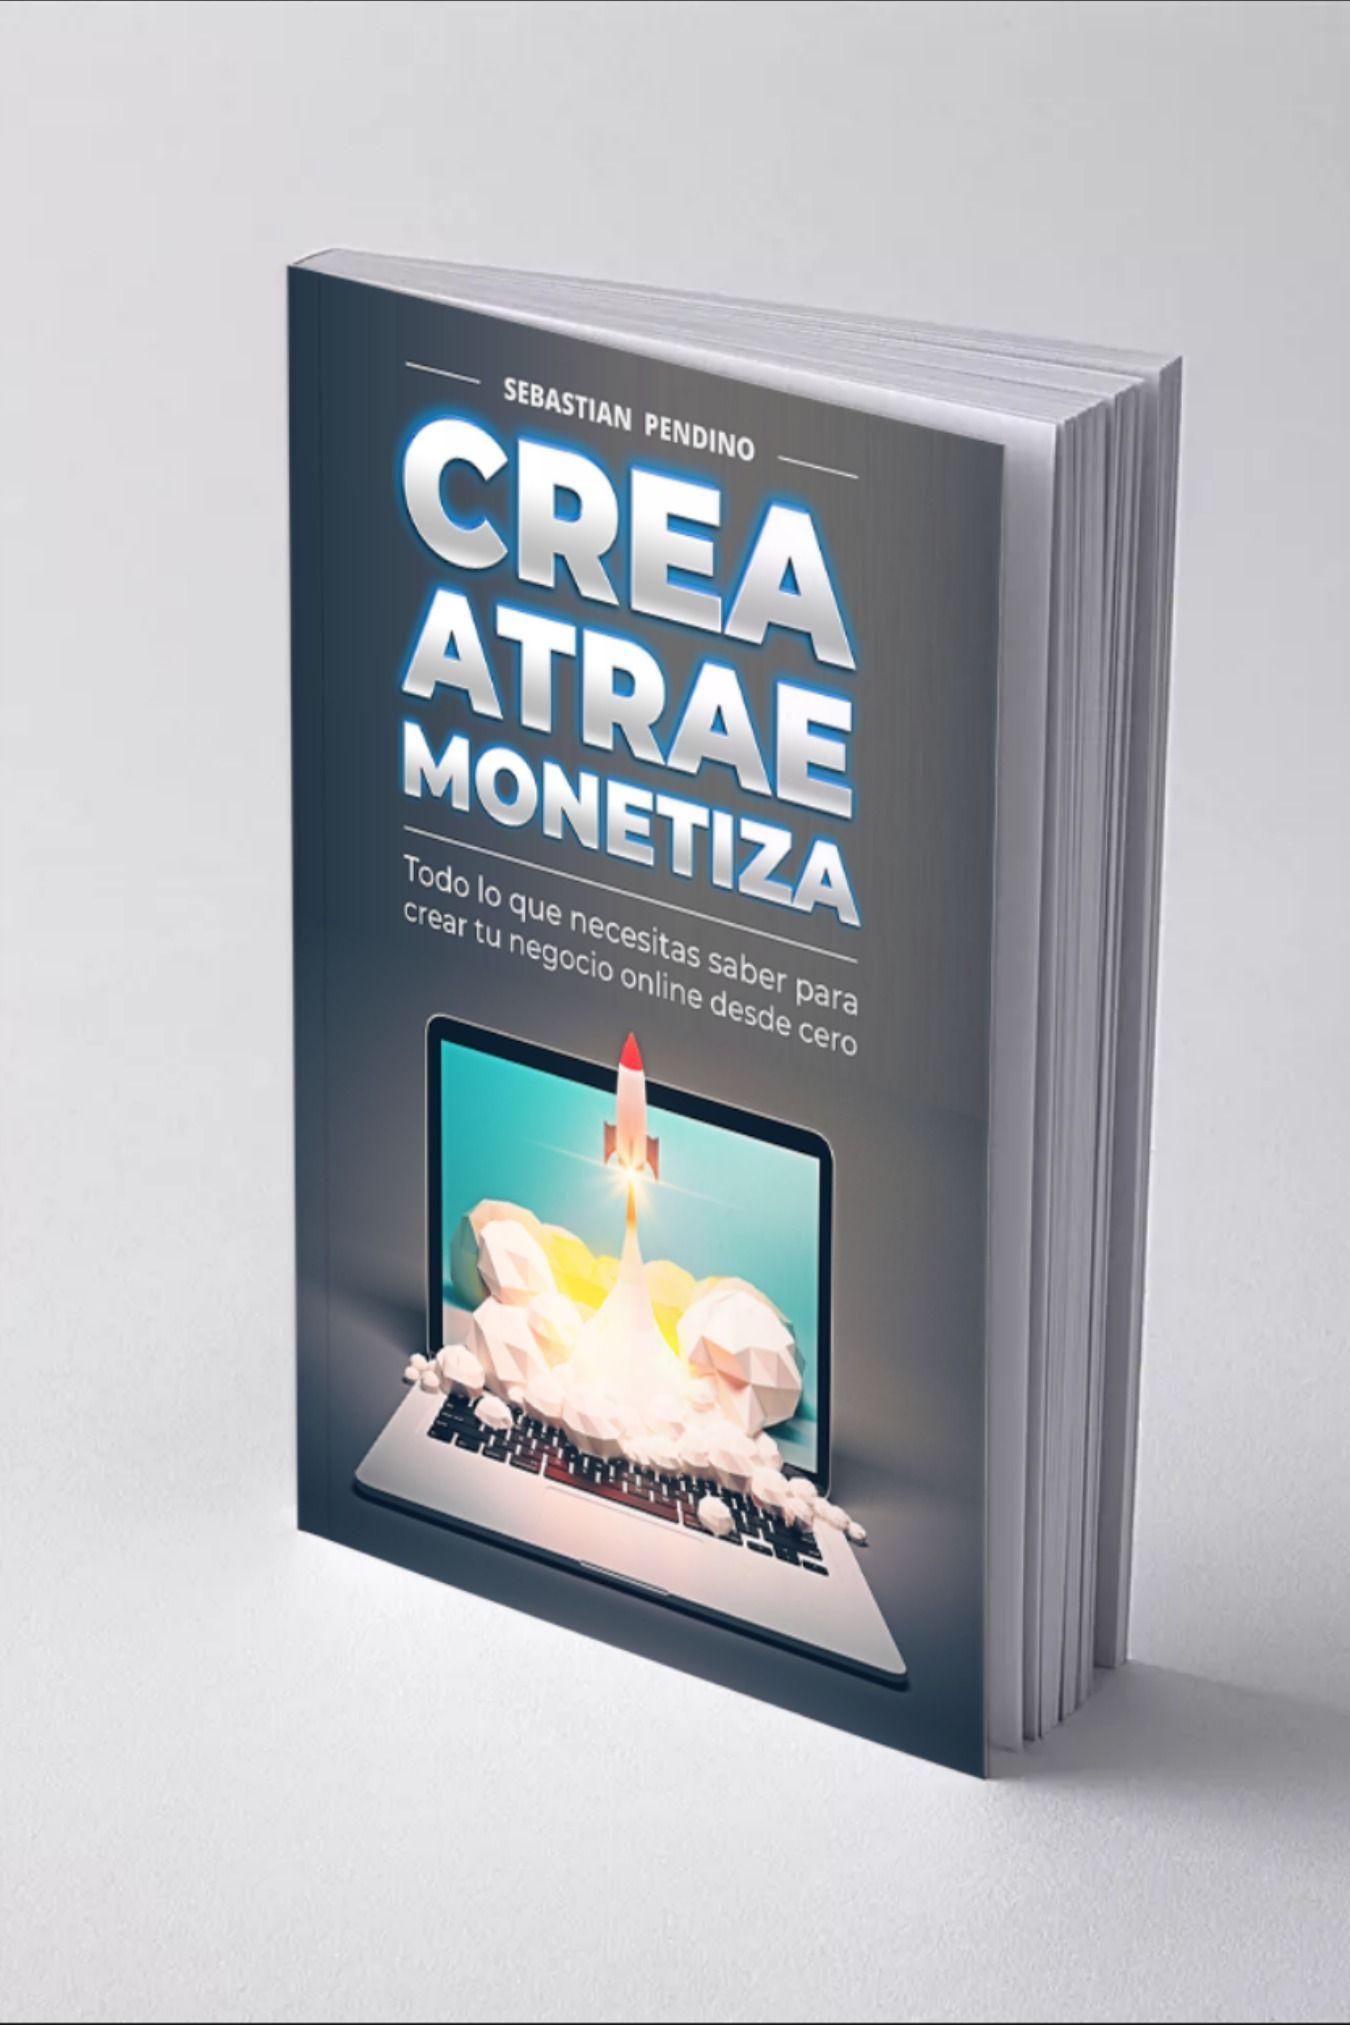 Libro Crea Atrae Y Monetiza Descarga Gratis Libros De Negocios Marketing Aprender A